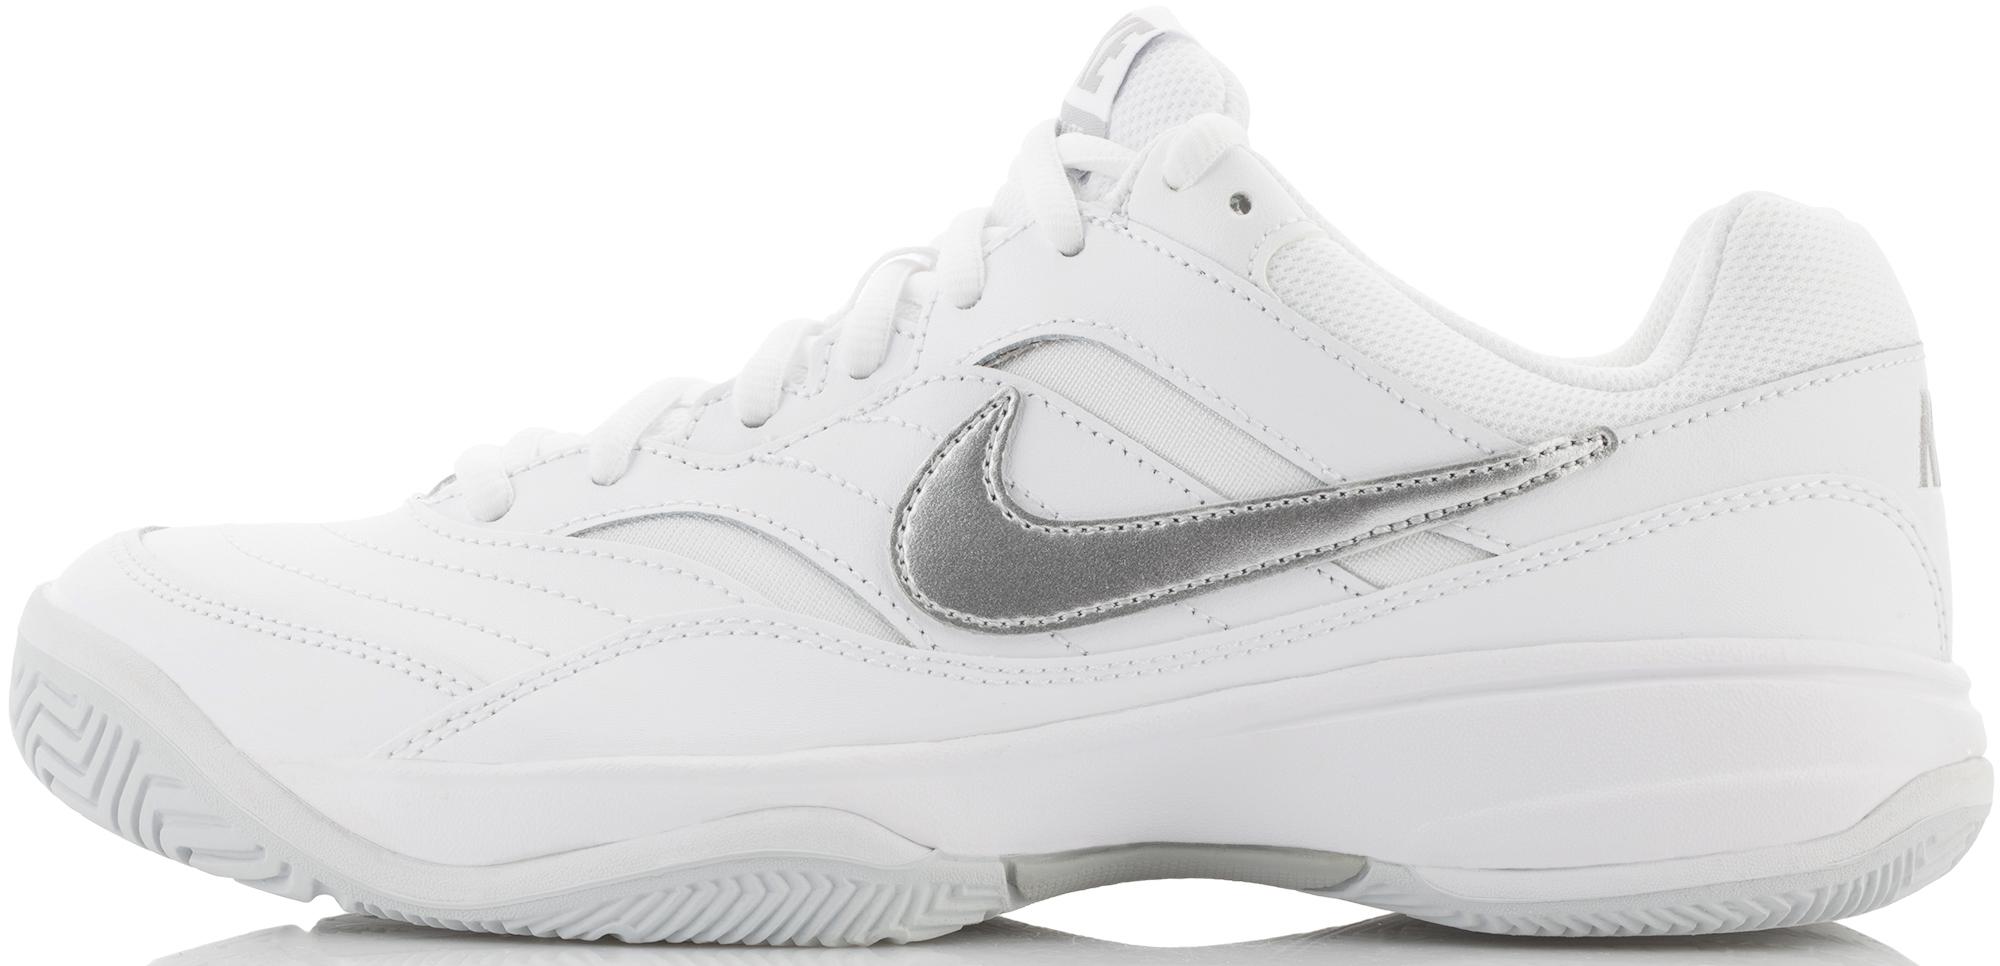 Nike Кроссовки женские Court Lite, размер 36,5